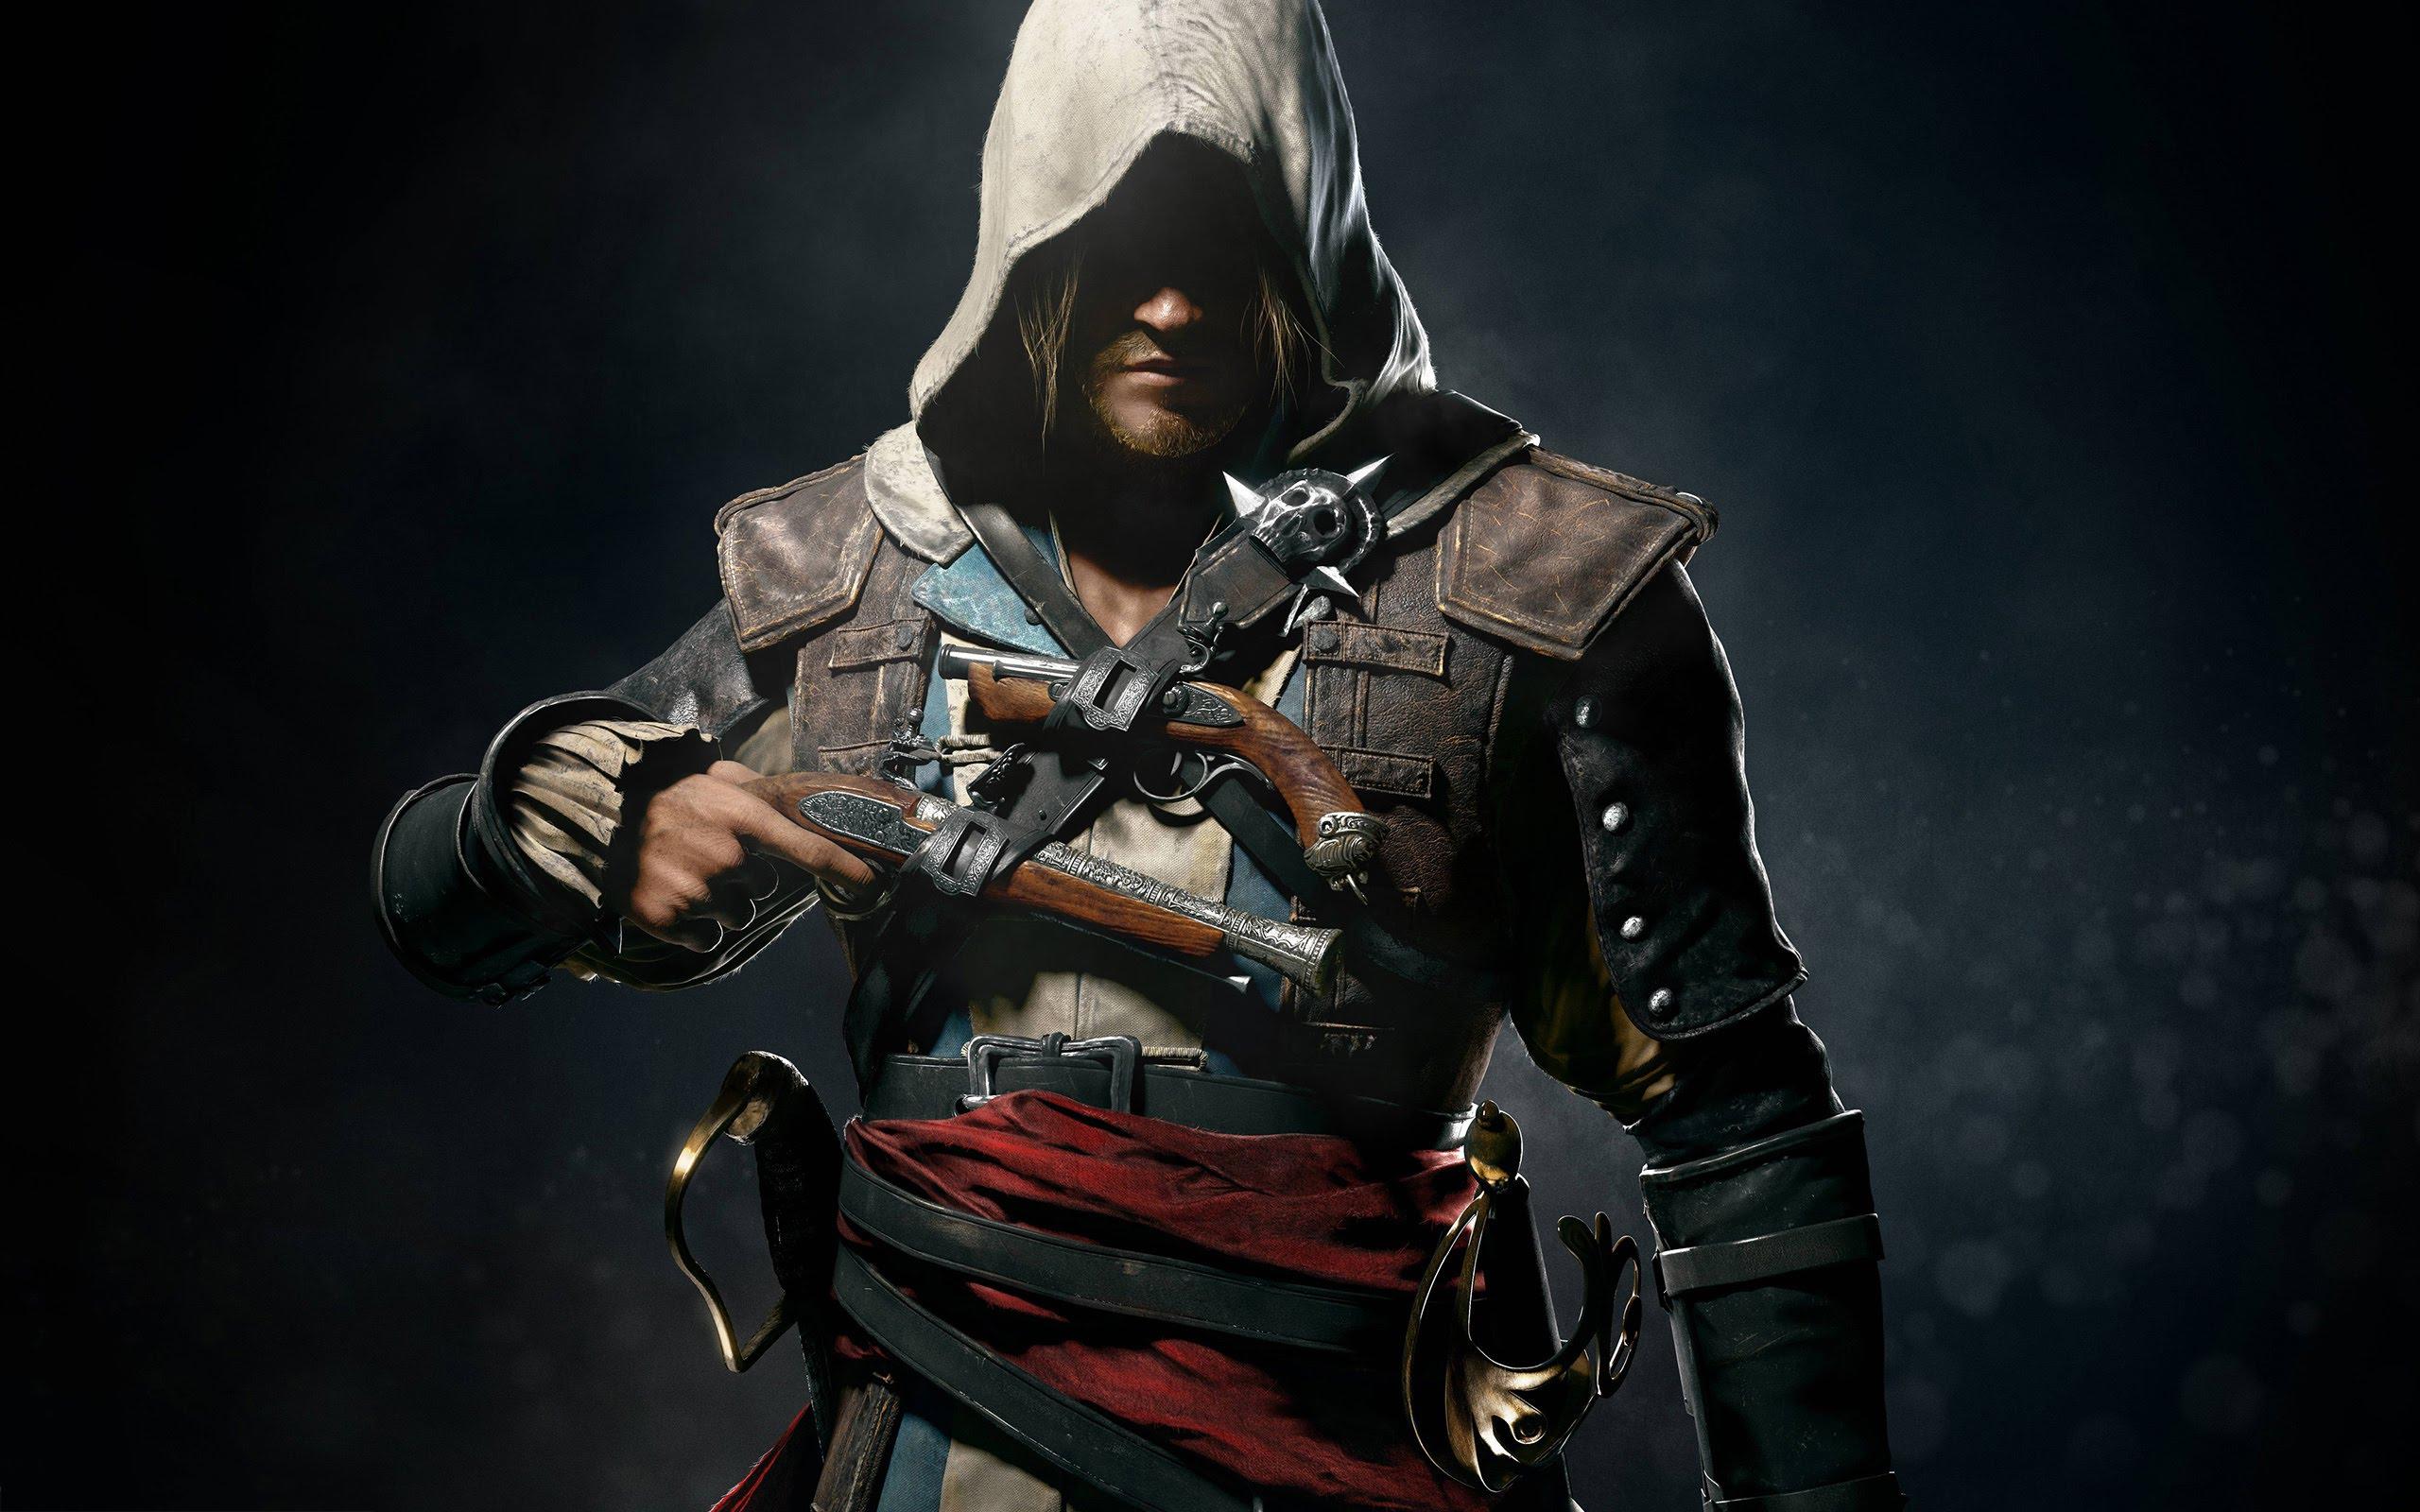 Assassins Creed Syndicate / Black Flag / Unity (PS4/Xone) @ Mediamarkt.nl